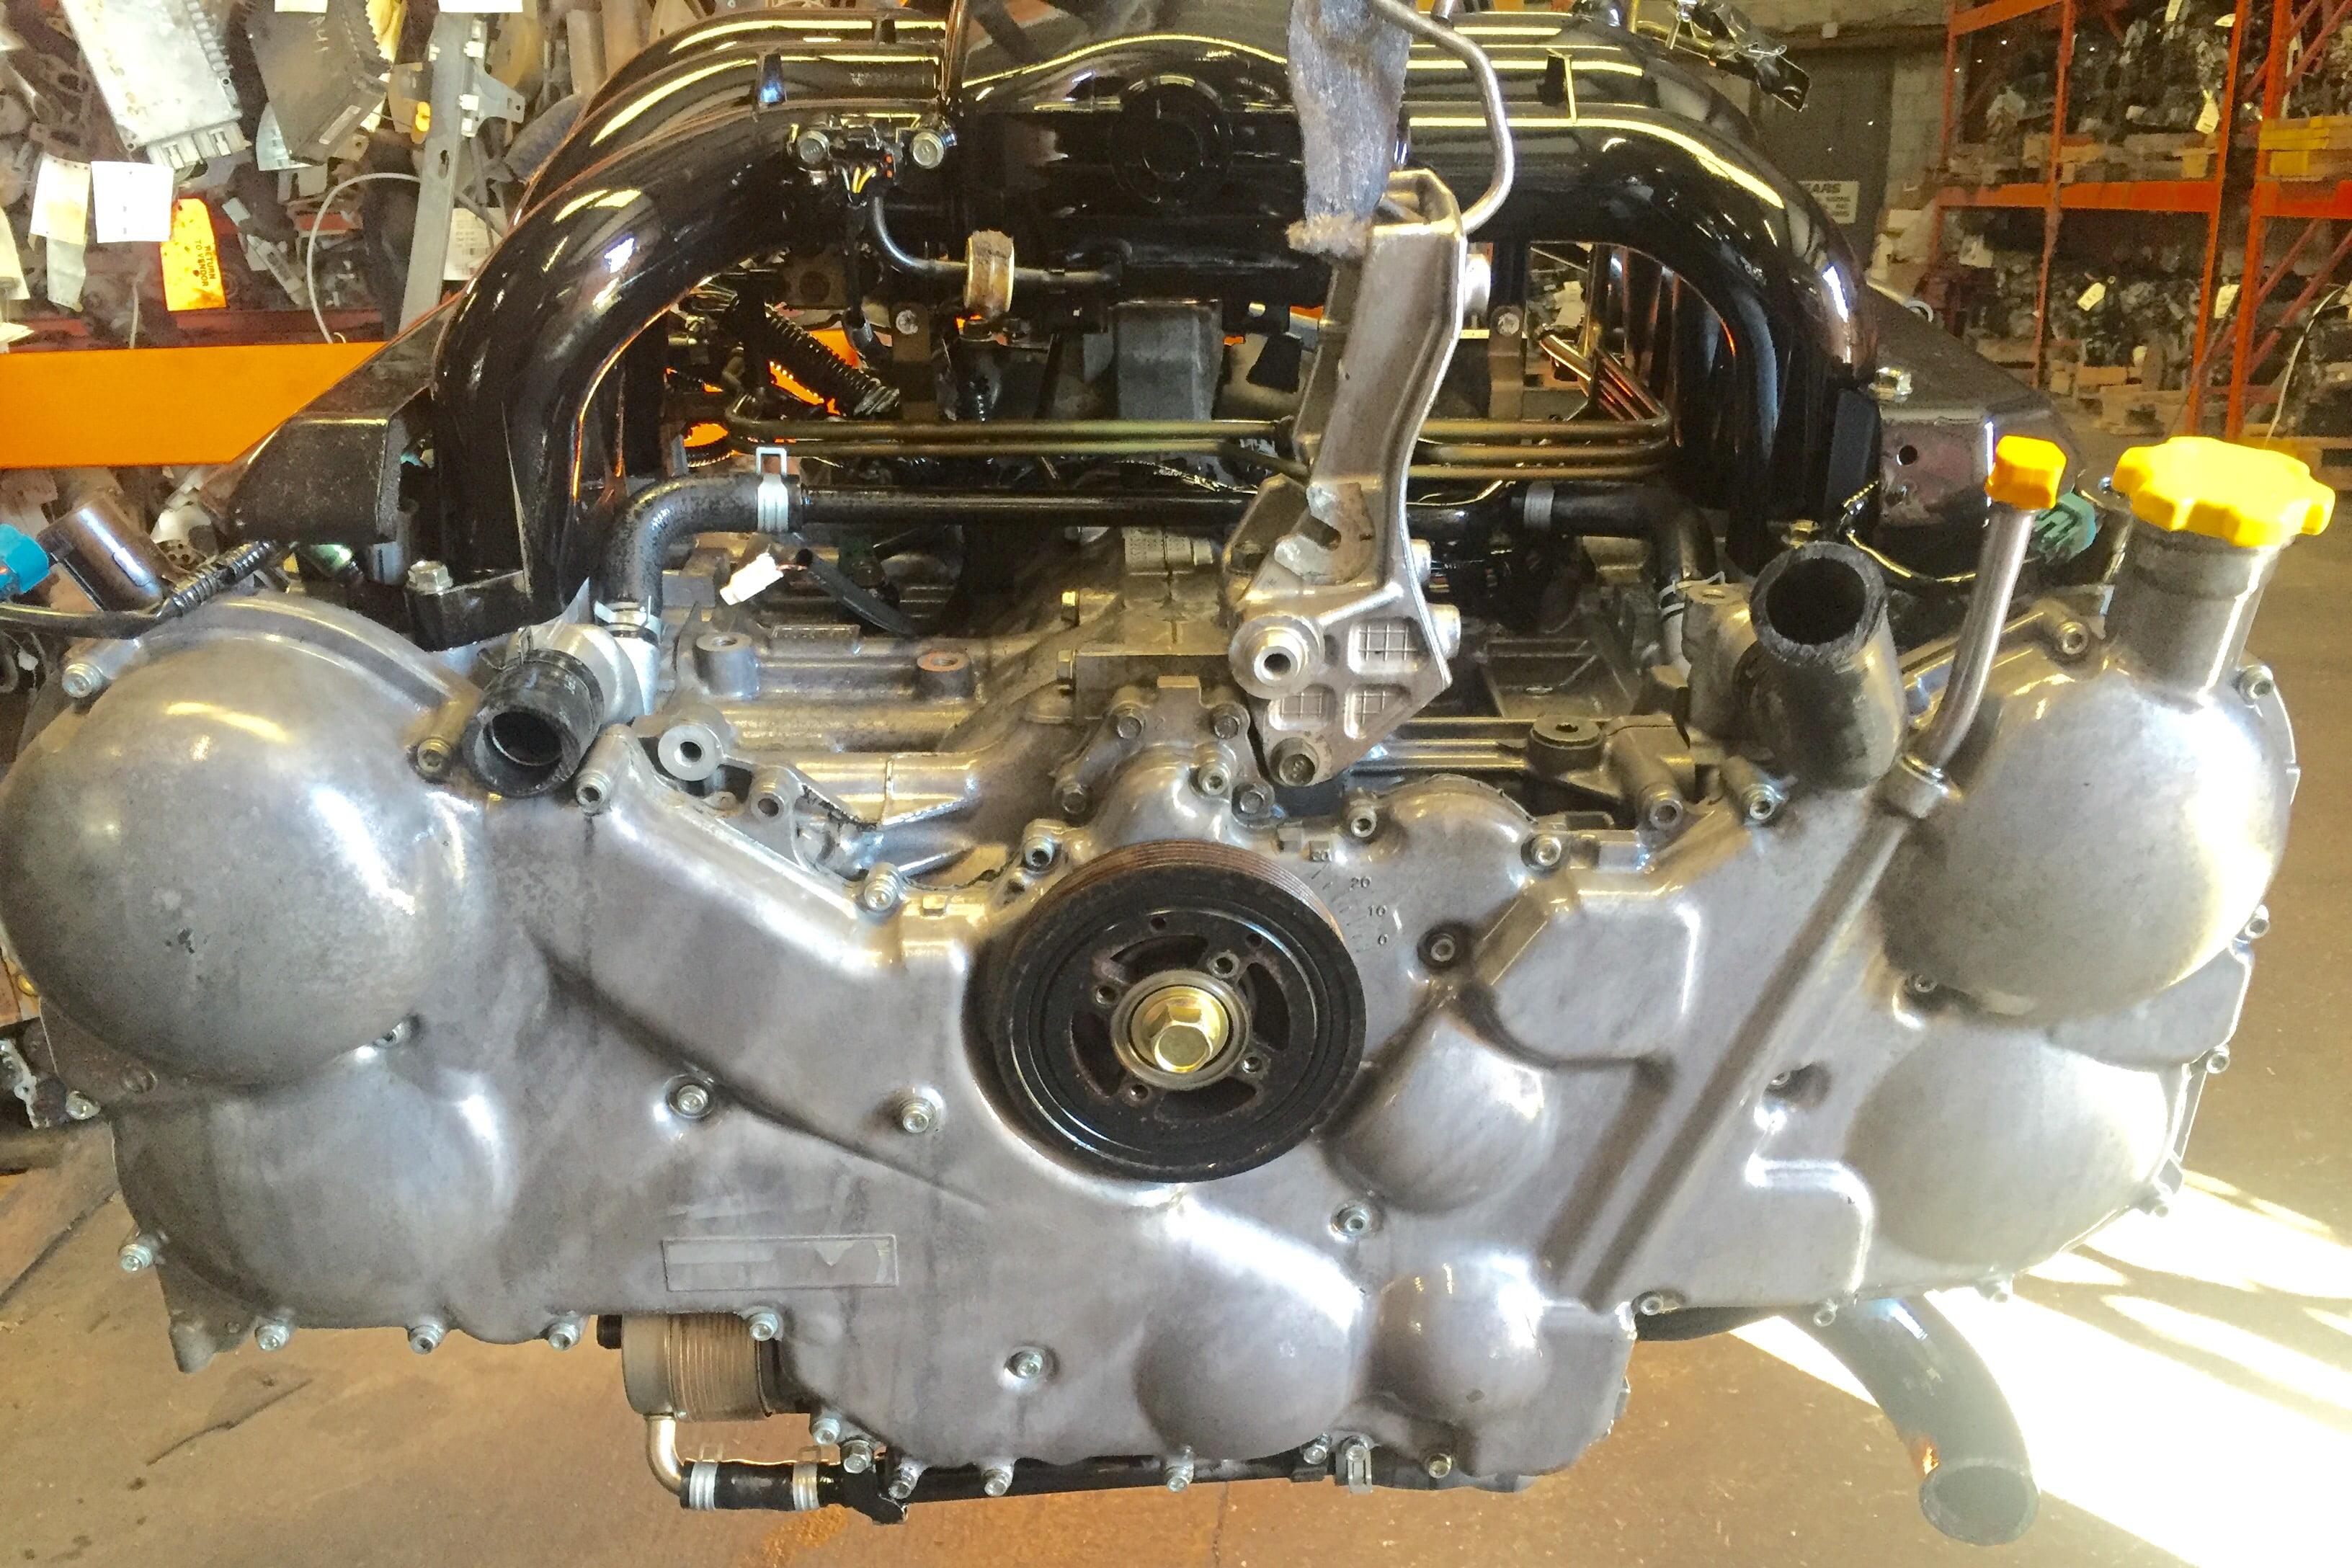 Subaru Legacy Outback Tribeca Engine 3 0L 2005 - 2009